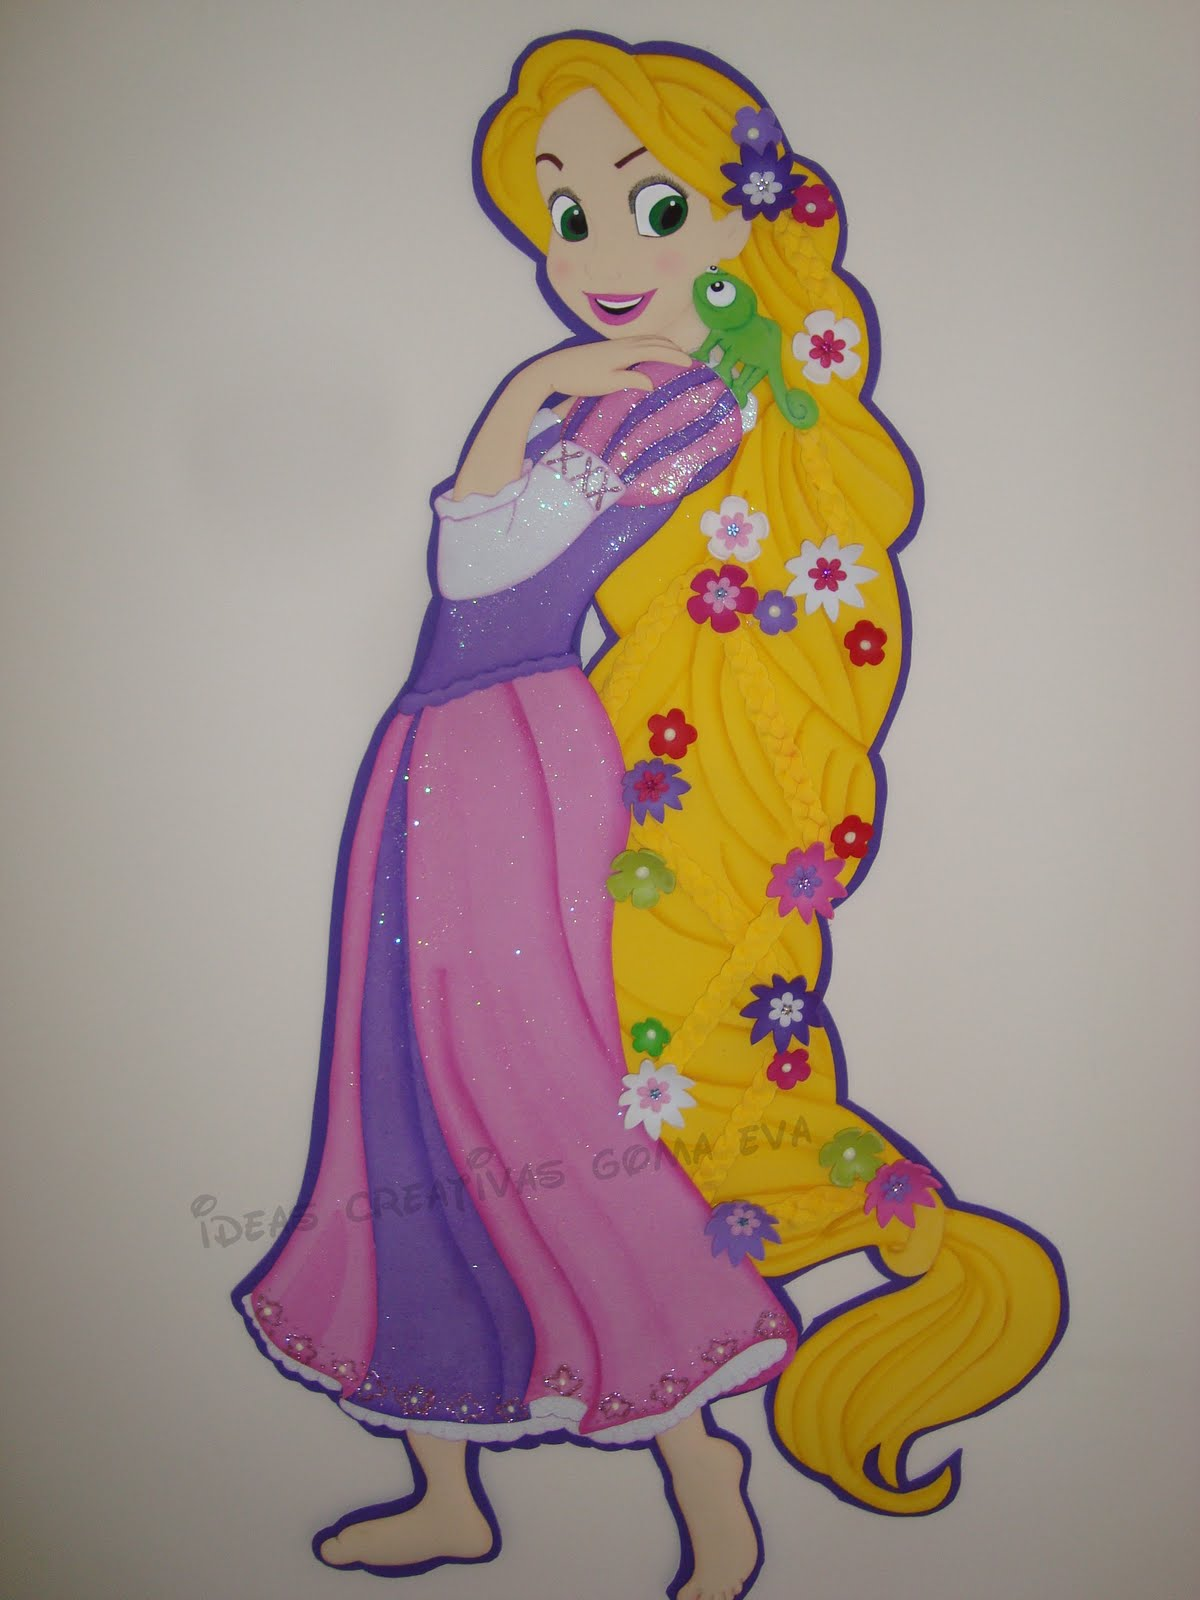 aplique en fomi princesa rapunzel gracias a adriana del taller de nana ...